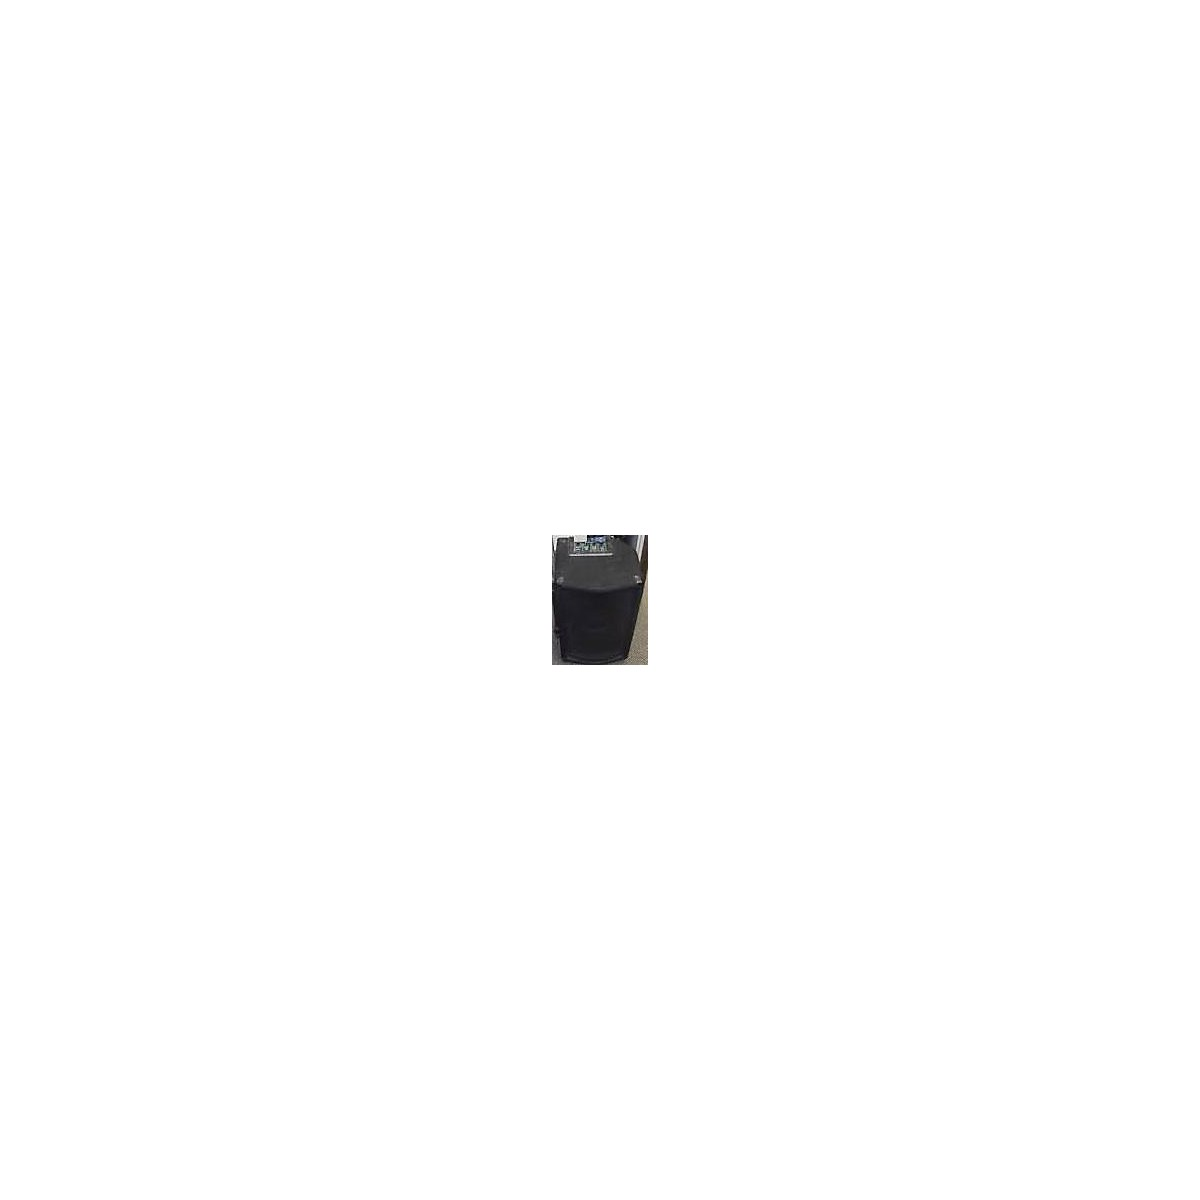 SoundTech AL1 Powered Speaker